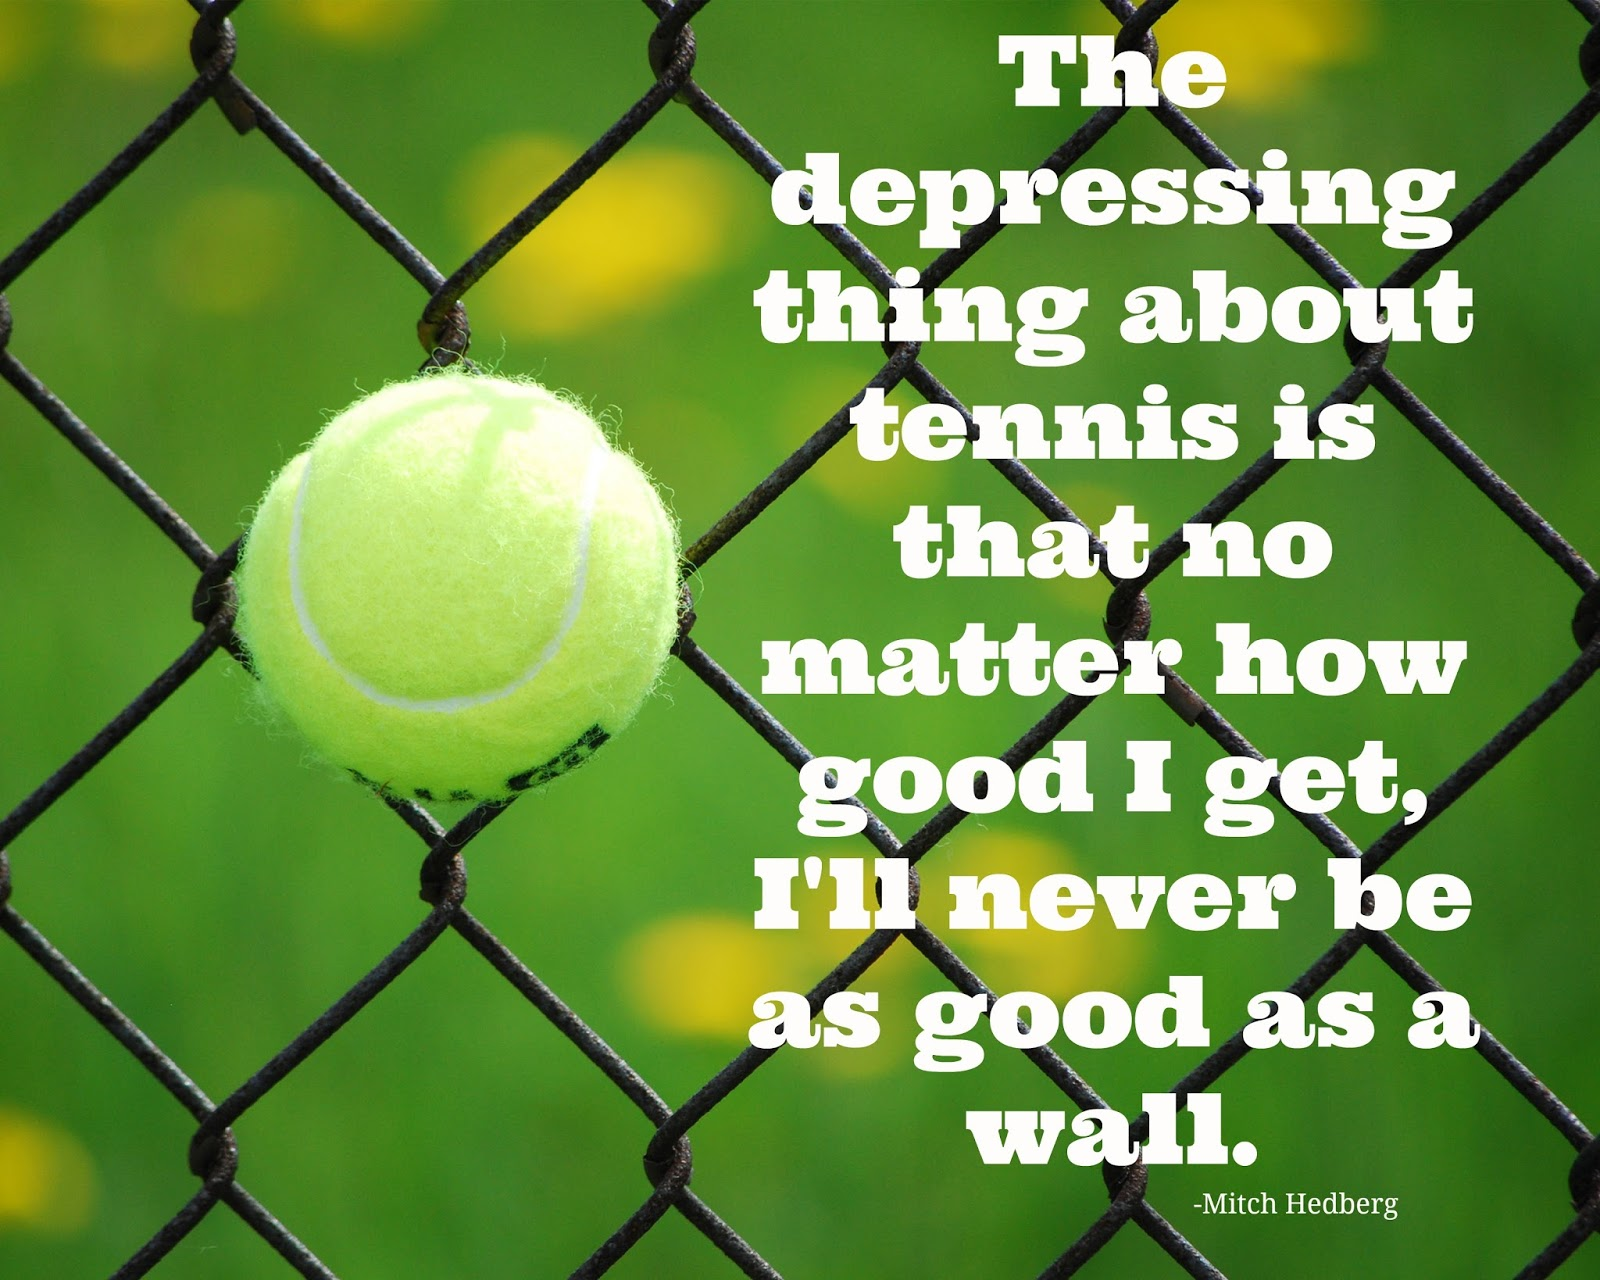 CJO Photo: Printable Sports Art 8x10: Tennis Quote   Never as Good